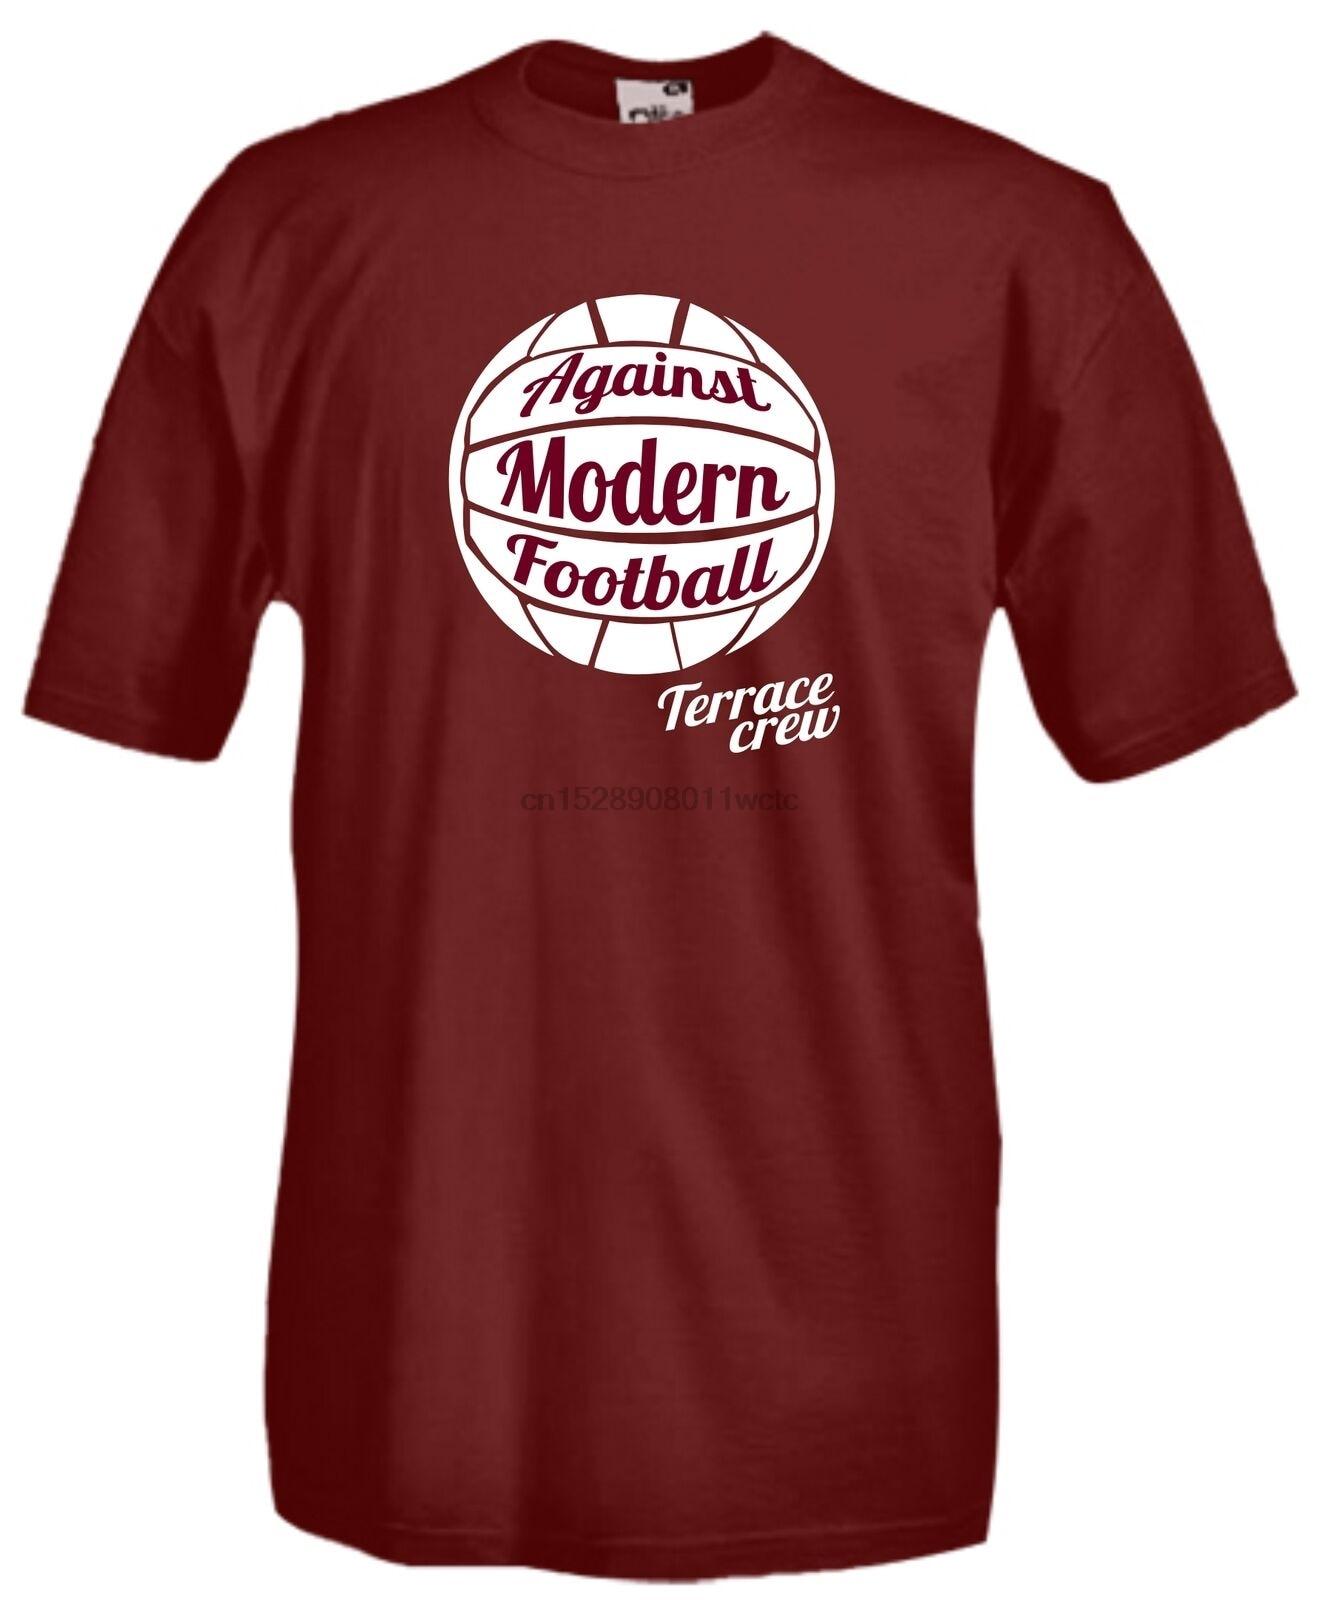 T-Shirt Laurel Leaf Football Soccer Ultras Casuals Hooligans Tee